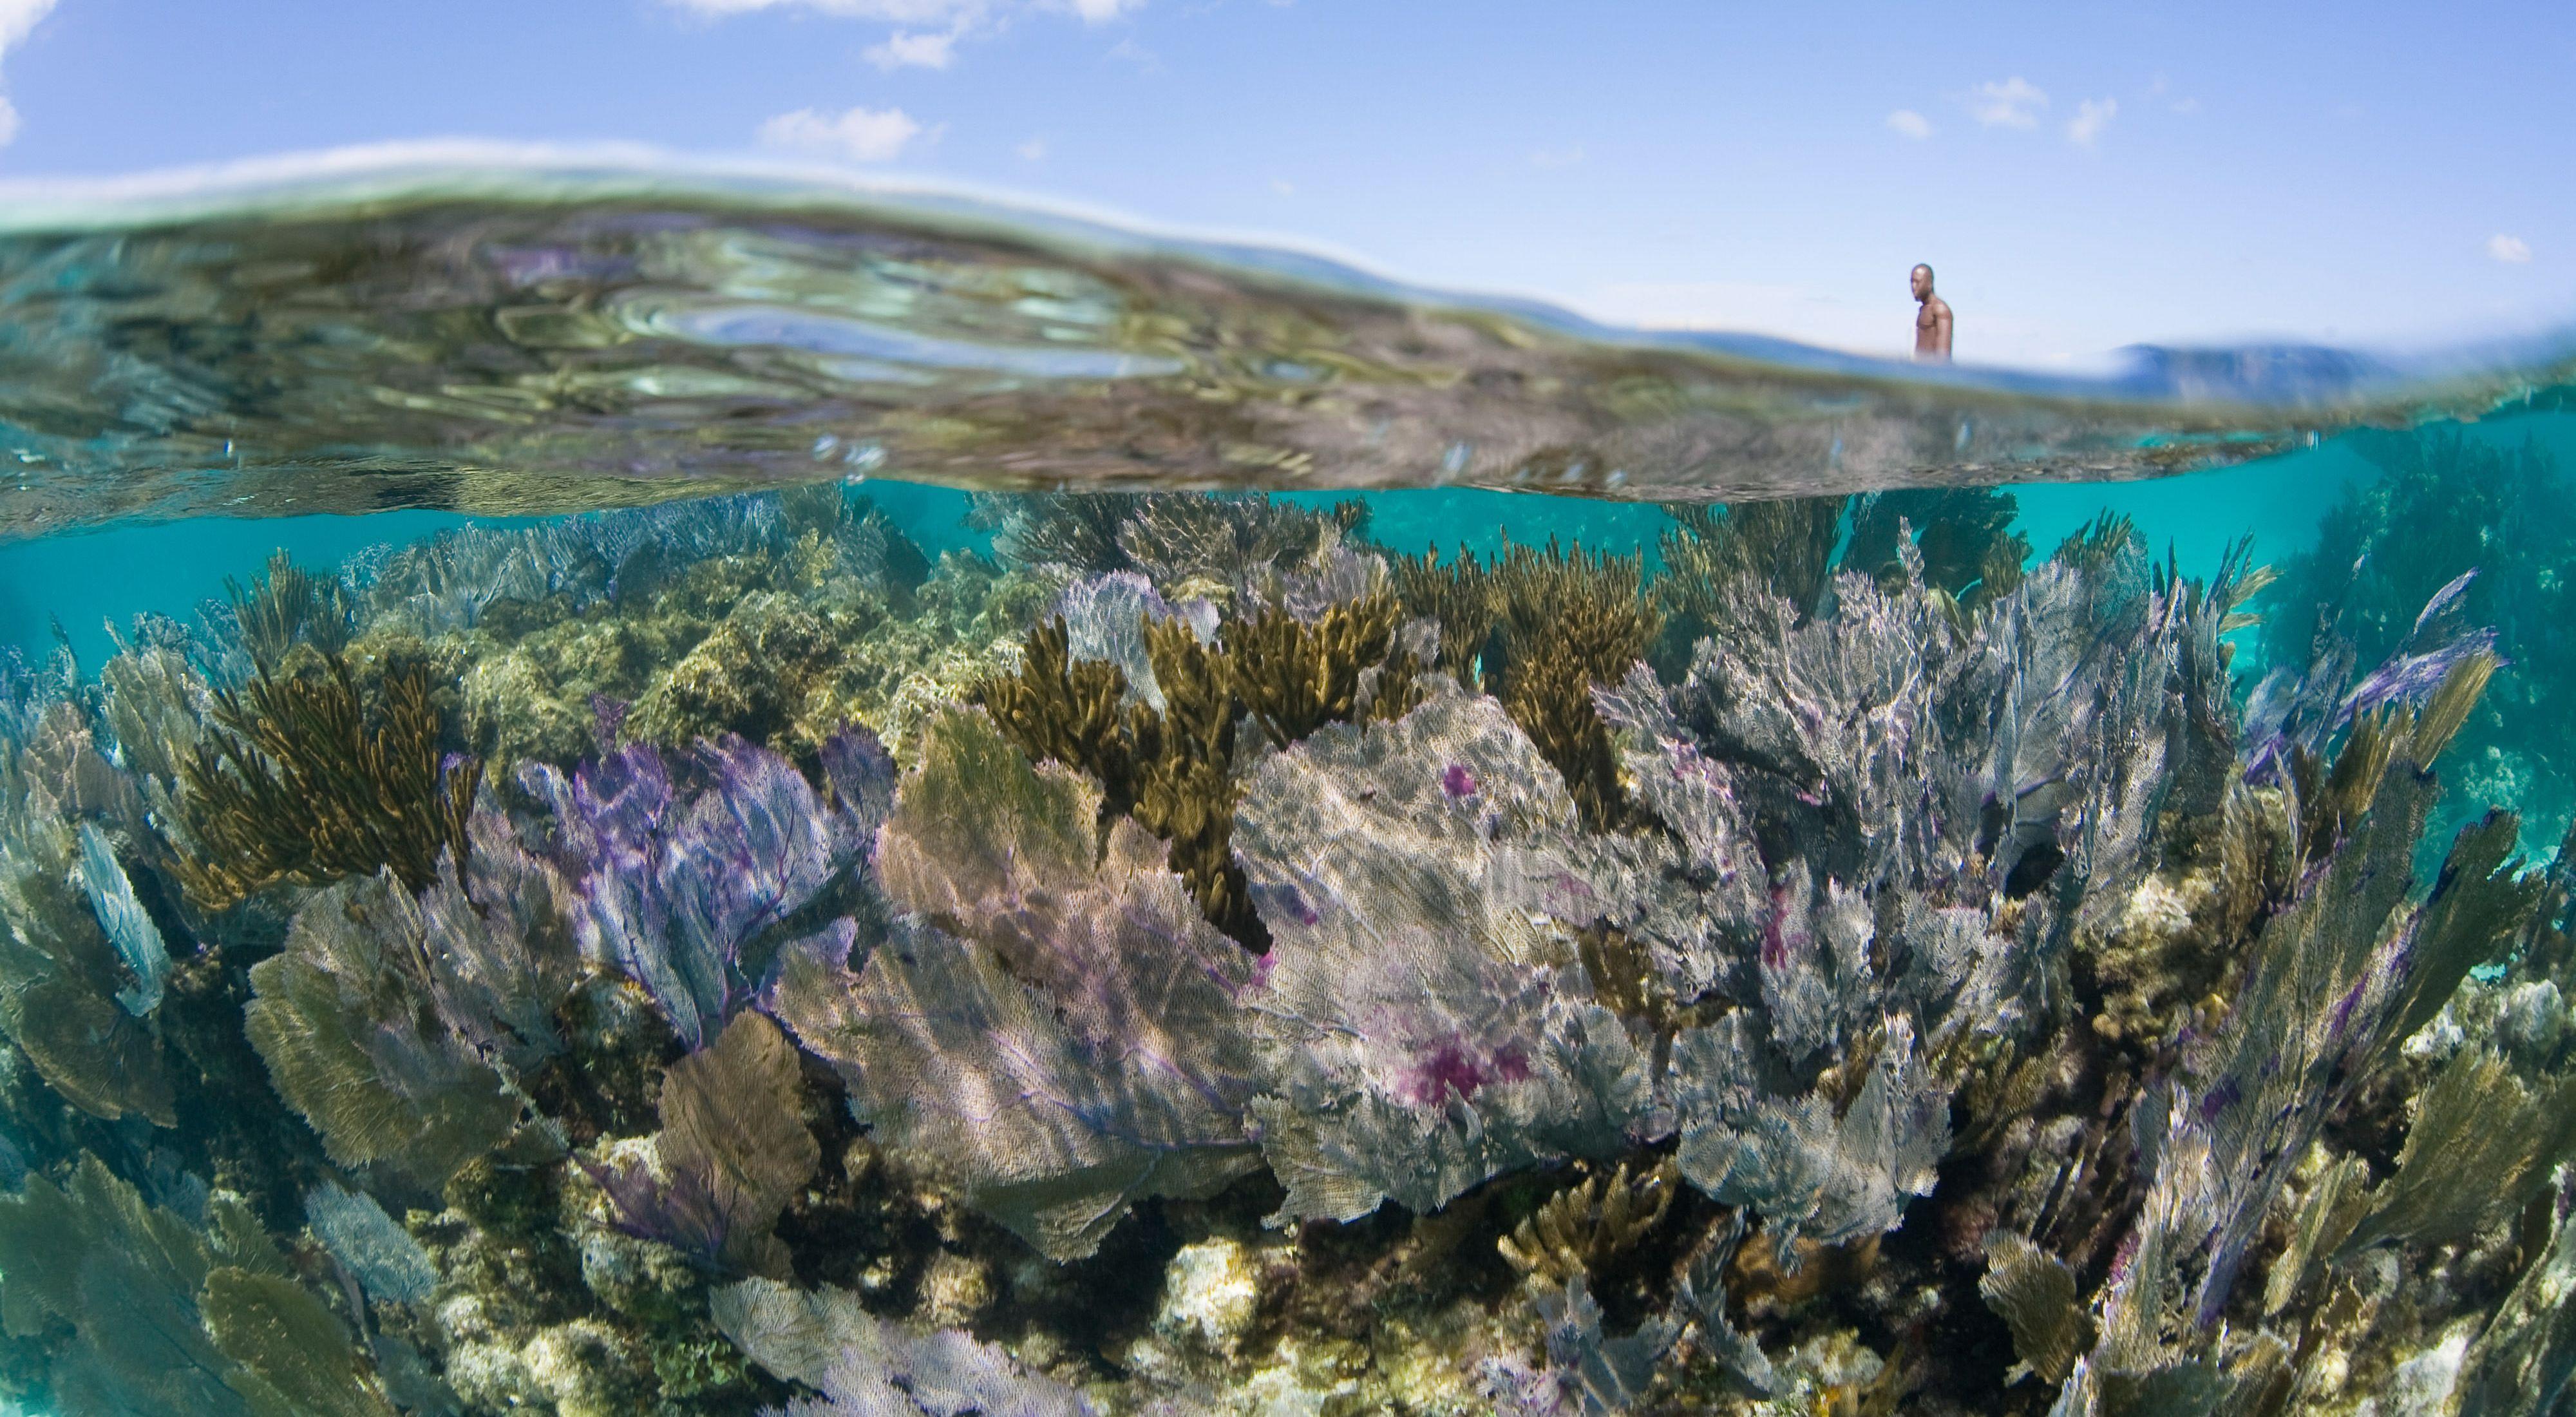 Gorgonians, blue sky and kayaker, Turneffe Atoll, Belize, Caribbean.